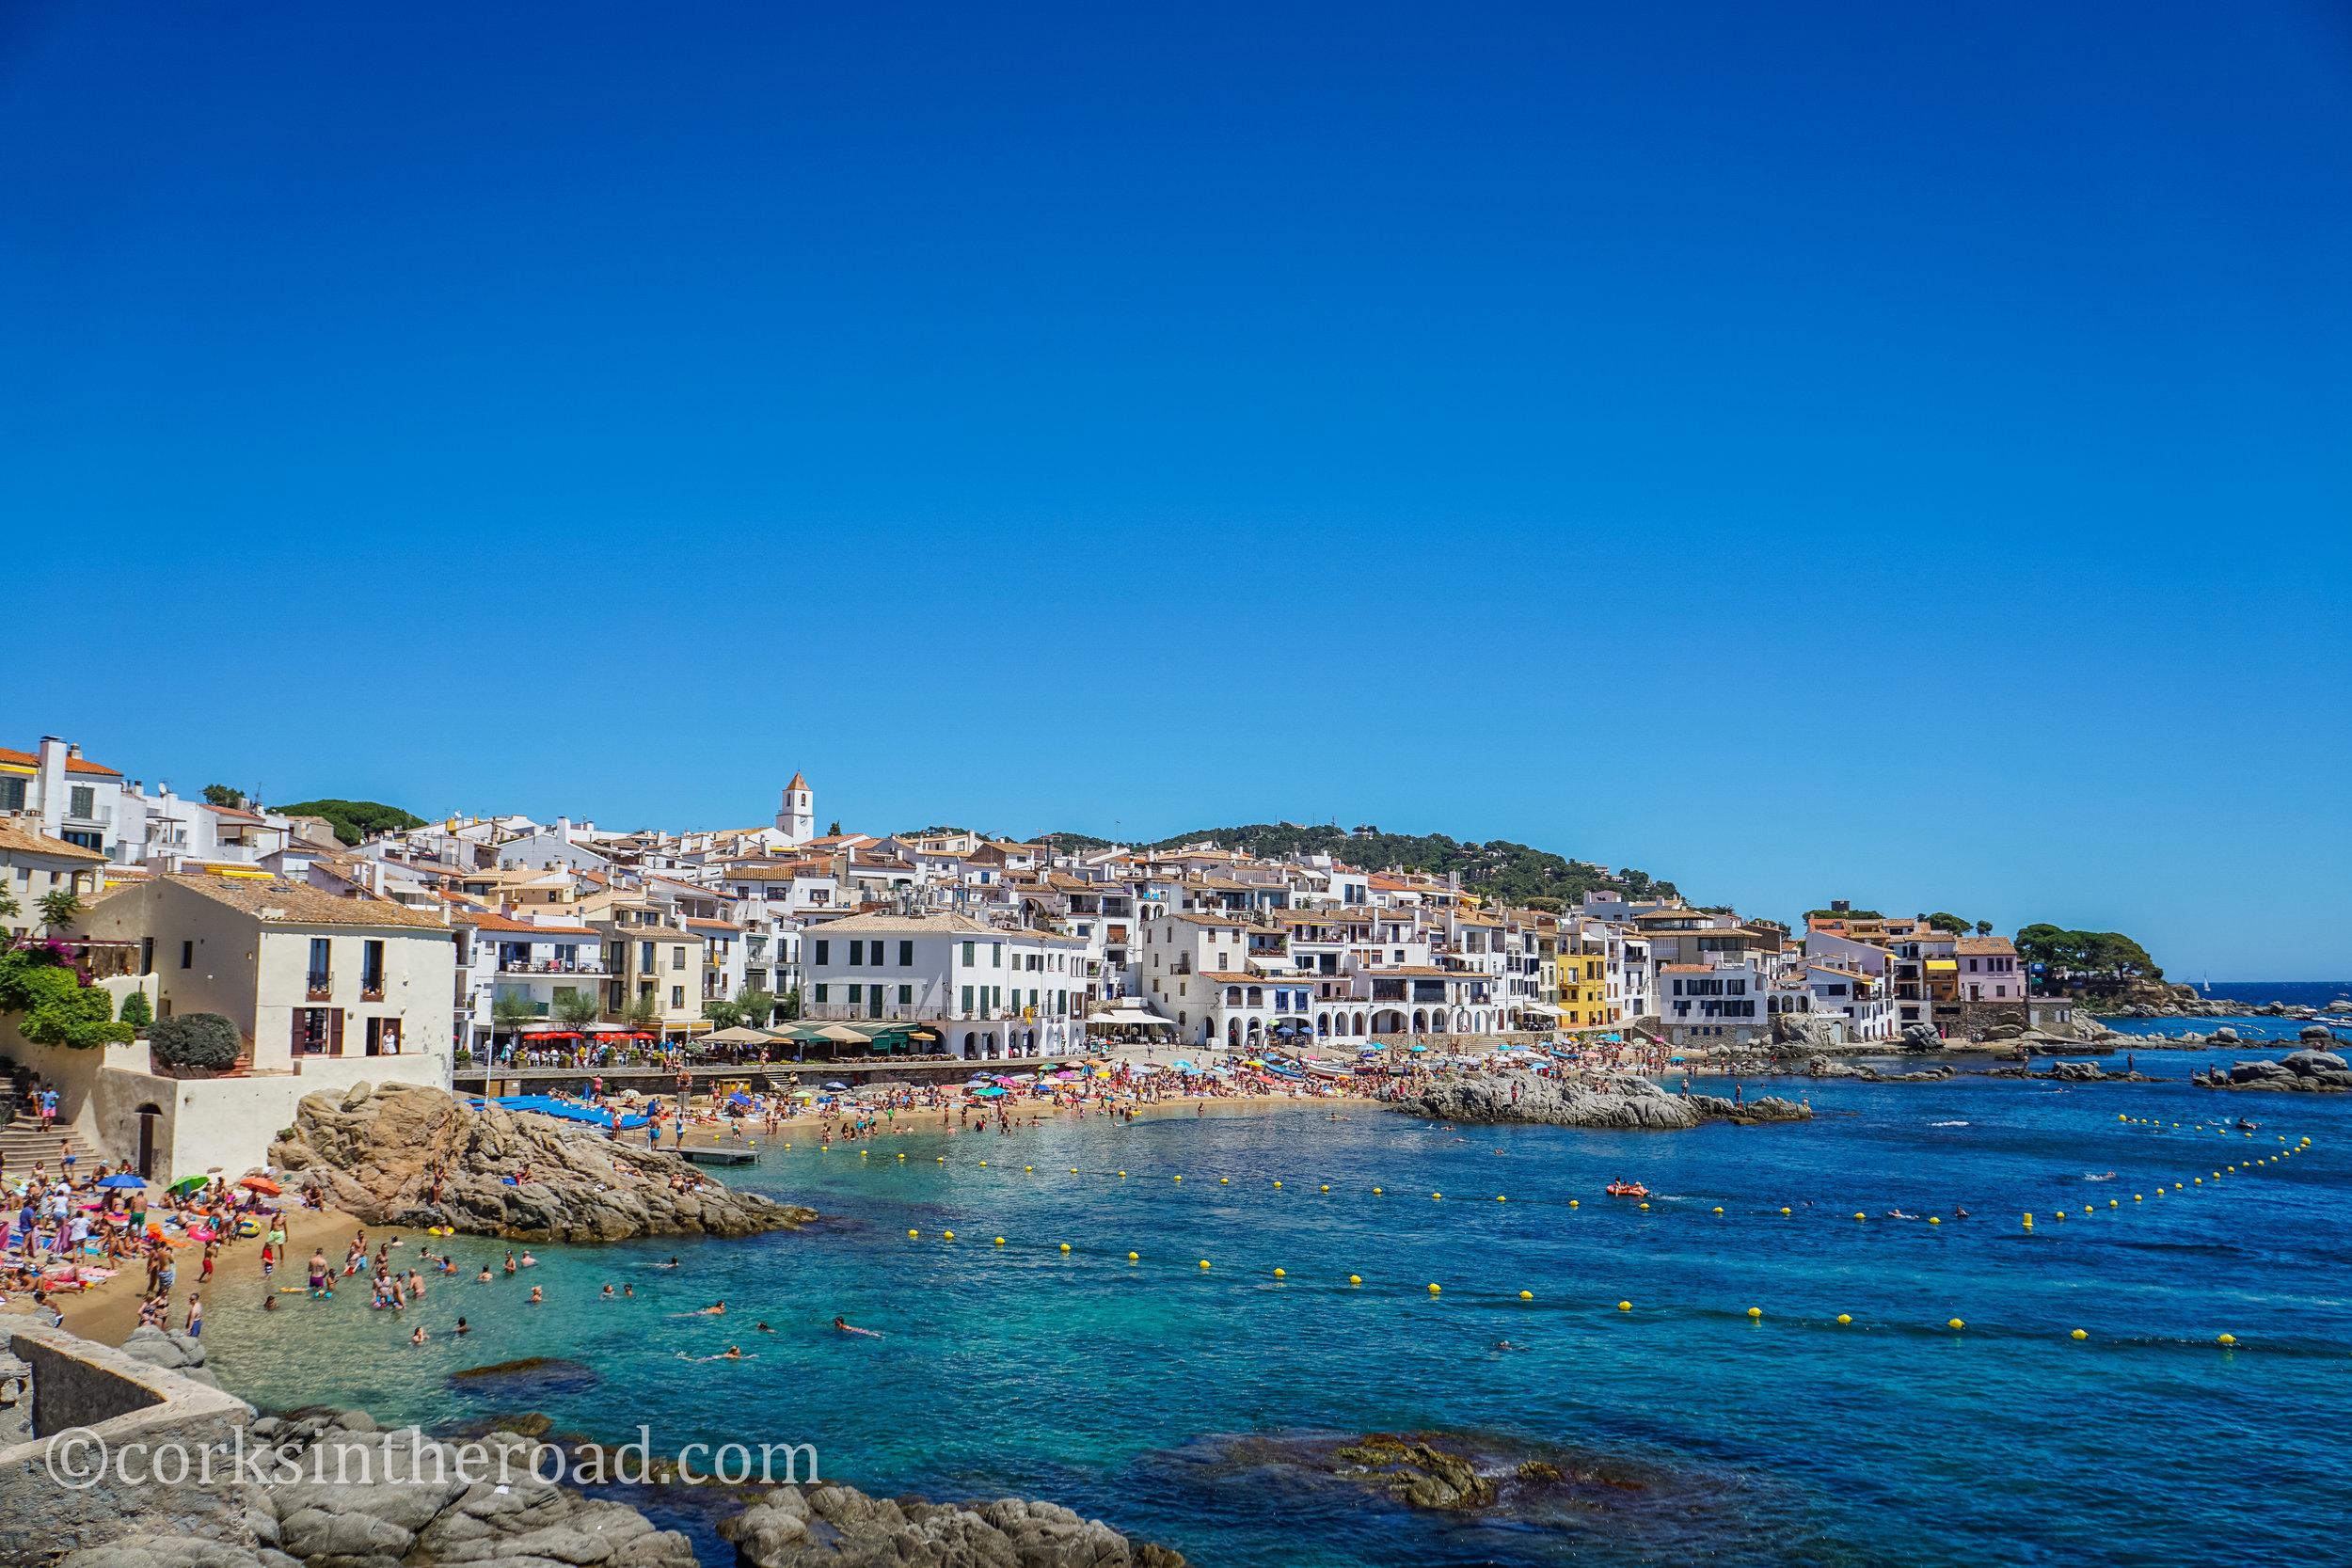 20160807Barcelona, Beaches, Corksintheroad, Costa Brava, Costa Brava Landscape-8.jpg